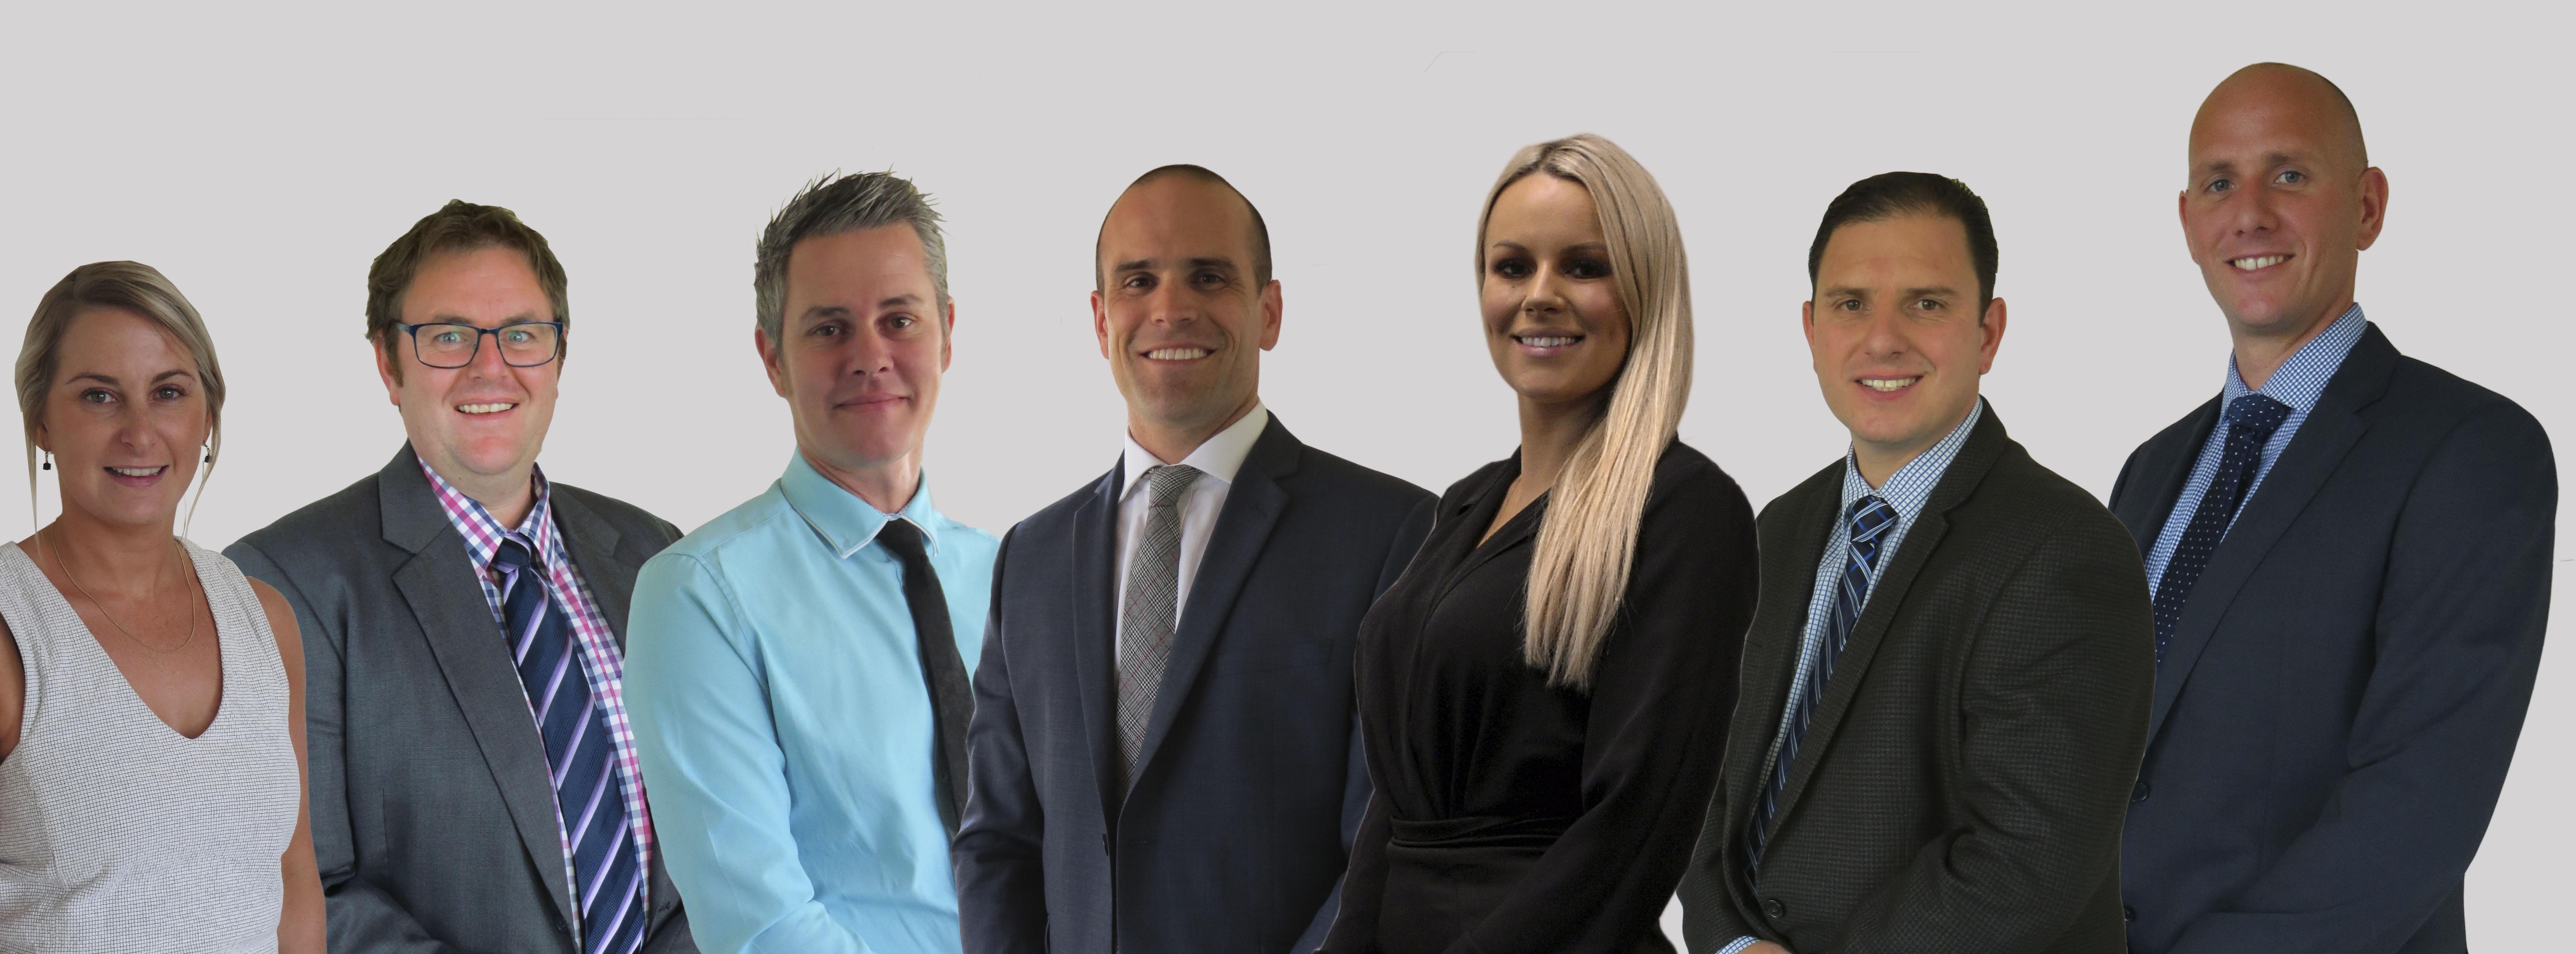 Medipak Surgical Sales Team 2019